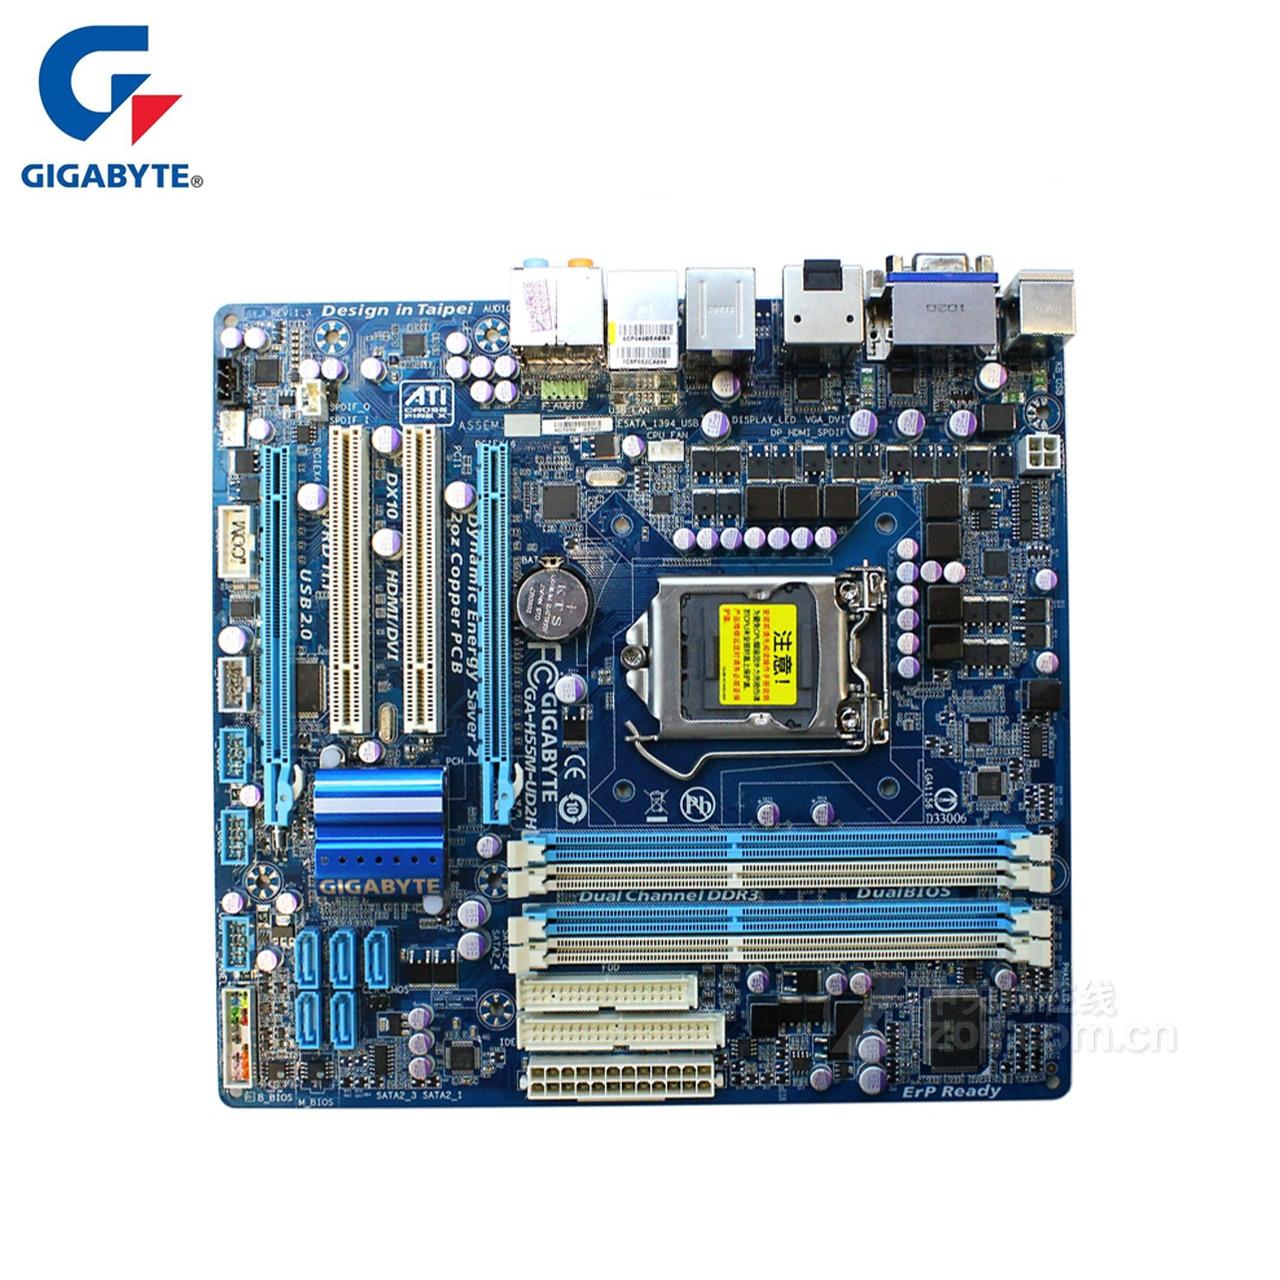 Gigabyte GA-H55M-UD2H 100% D'origine Carte Mère LGA 1156 DDR3 16g H55 H55M-UD2H De Bureau Carte Mère SATA II Systemboard Utilisé